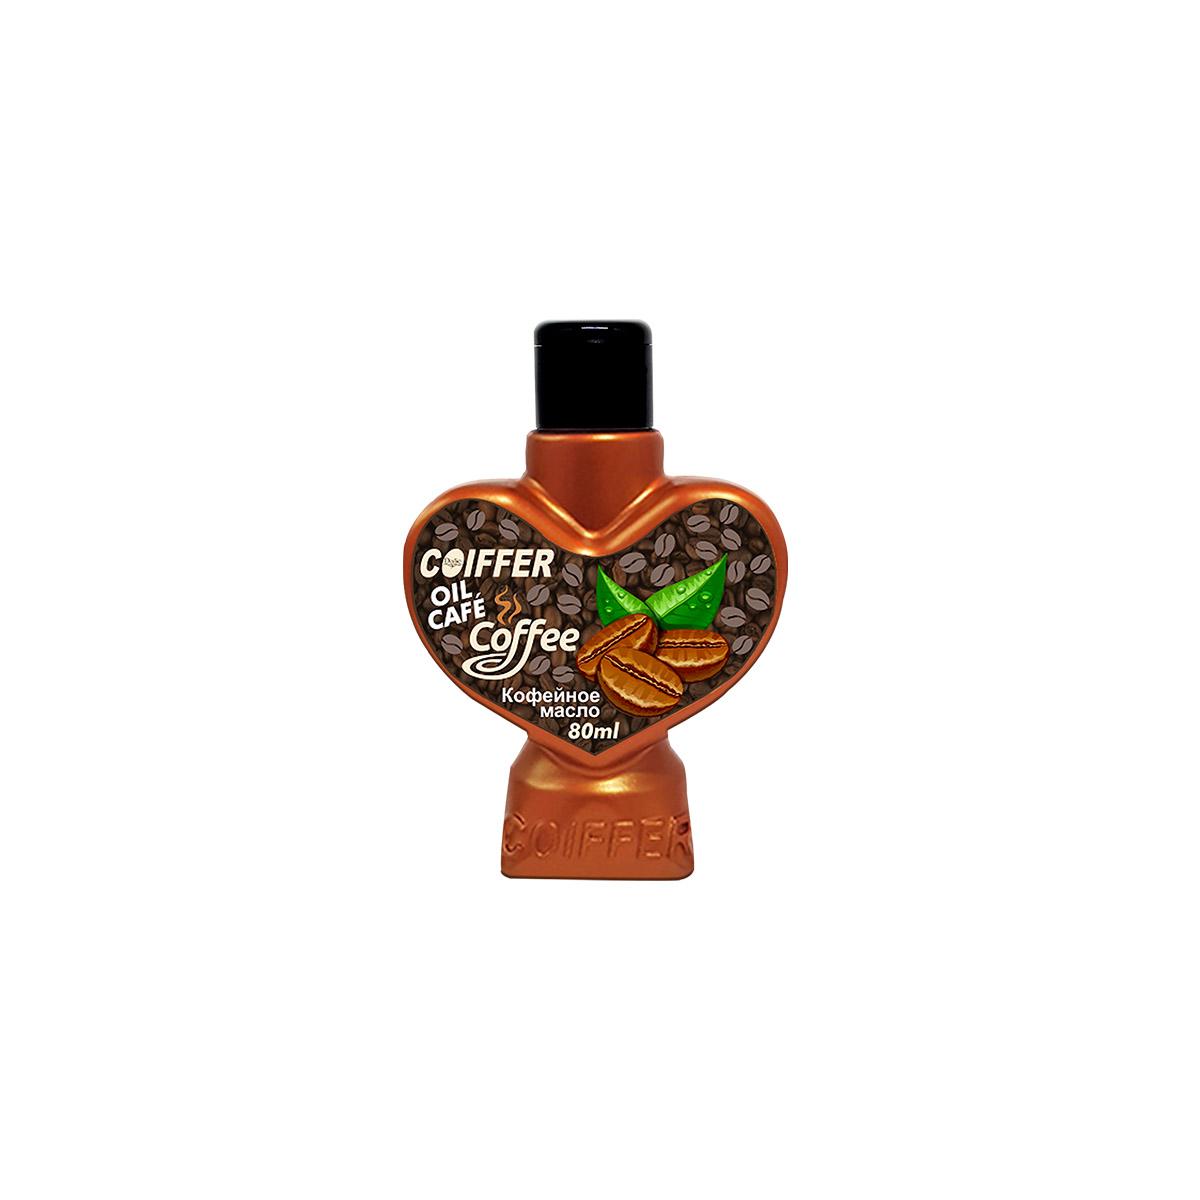 Finalizador Capilar Oil Coffee  Coiffer 80ml